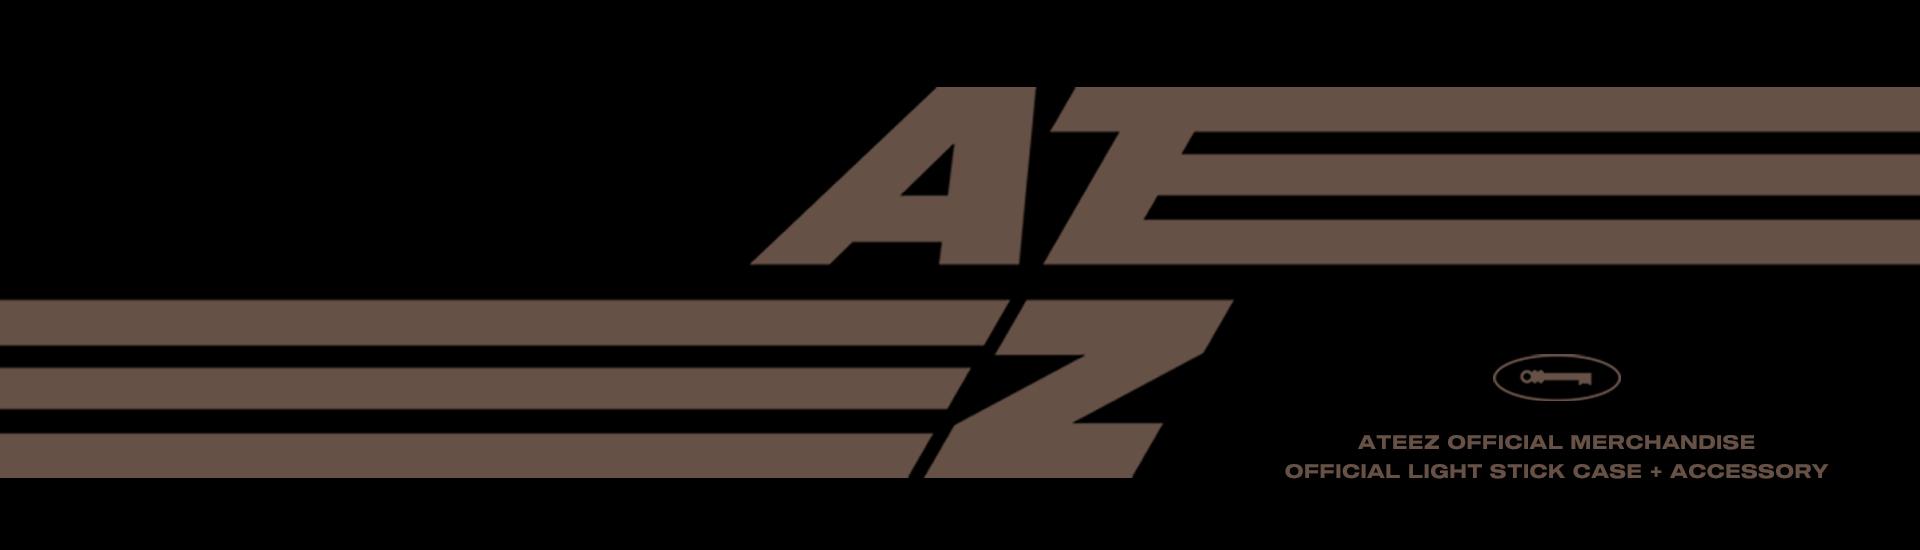 ATEEZ - OFFICIAL MERCHANDISE - OFFICIAL LIGHT STICK CASE